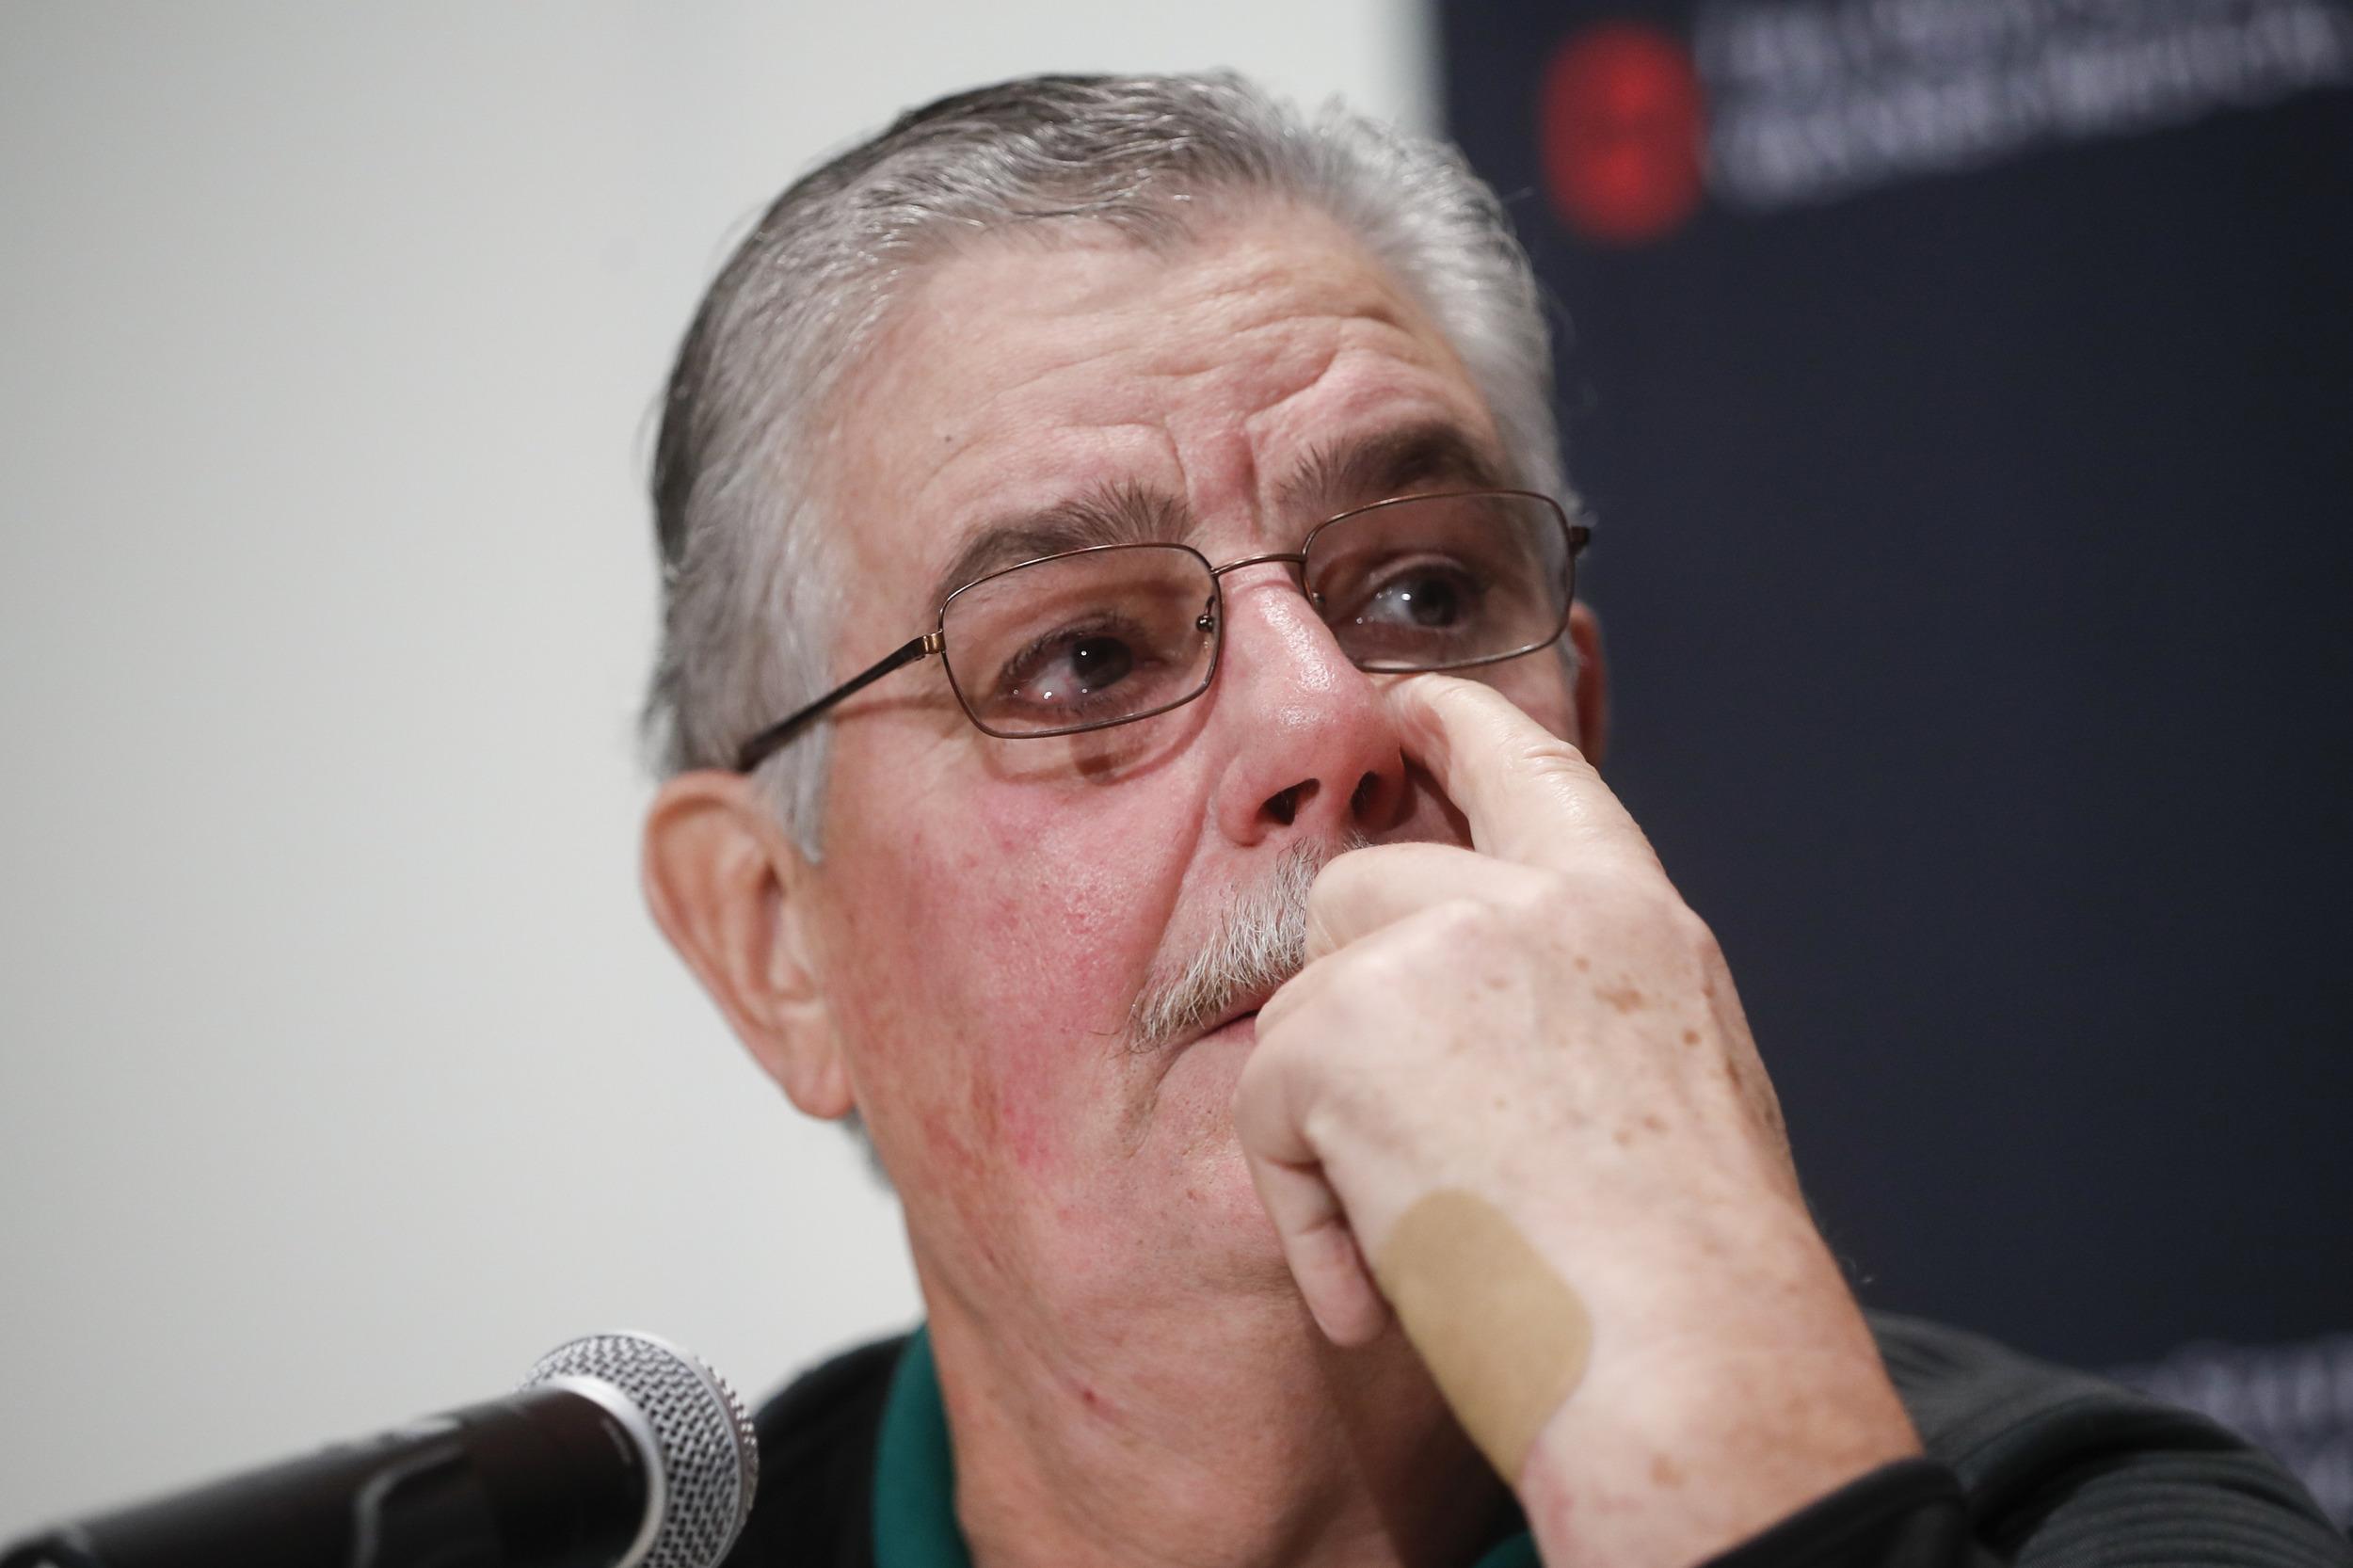 'It All Happened So Fast': Ohio State Prof. Recalls Attack